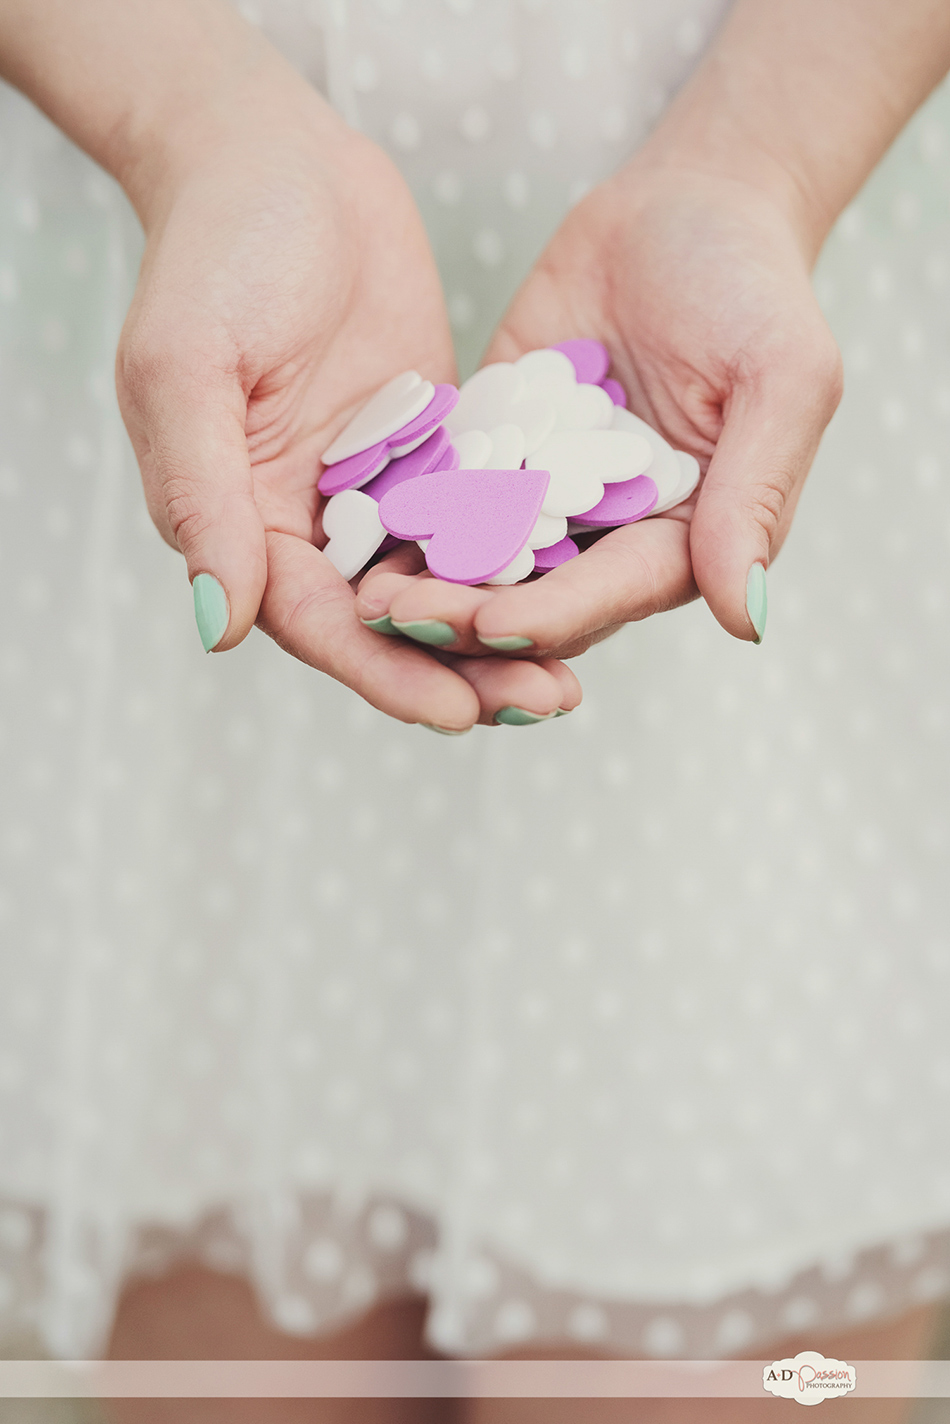 AD Passion Photography | irina-si-iulian_fotograf-profesionist__0025 | Adelin, Dida, fotograf profesionist, fotograf de nunta, fotografie de nunta, fotograf Timisoara, fotograf Craiova, fotograf Bucuresti, fotograf Arad, nunta Timisoara, nunta Arad, nunta Bucuresti, nunta Craiova